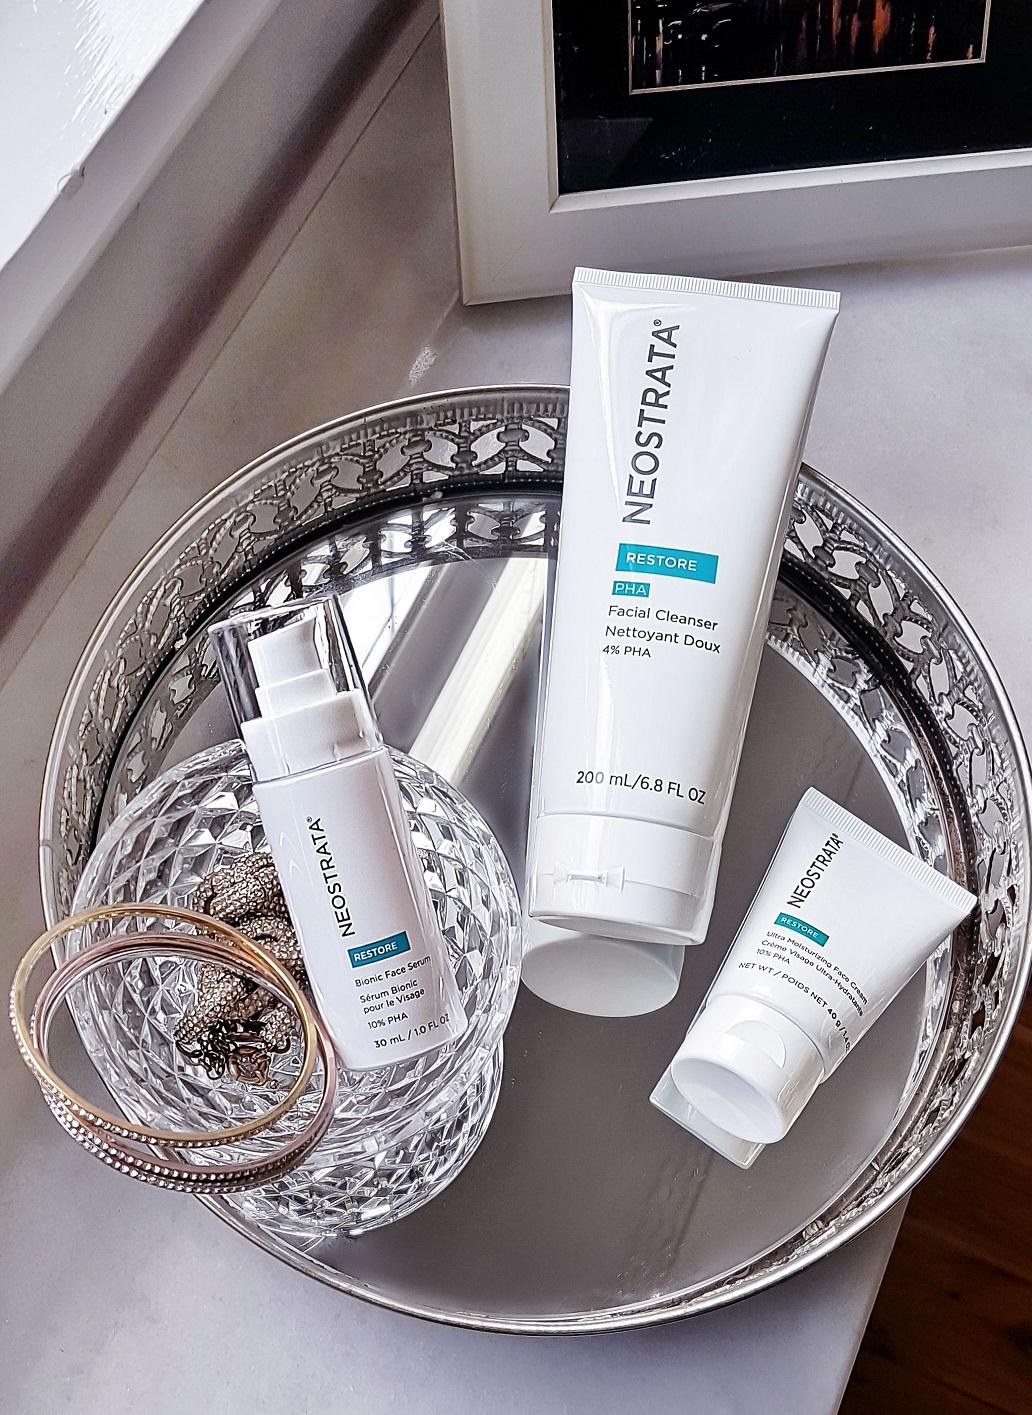 Skin care australia